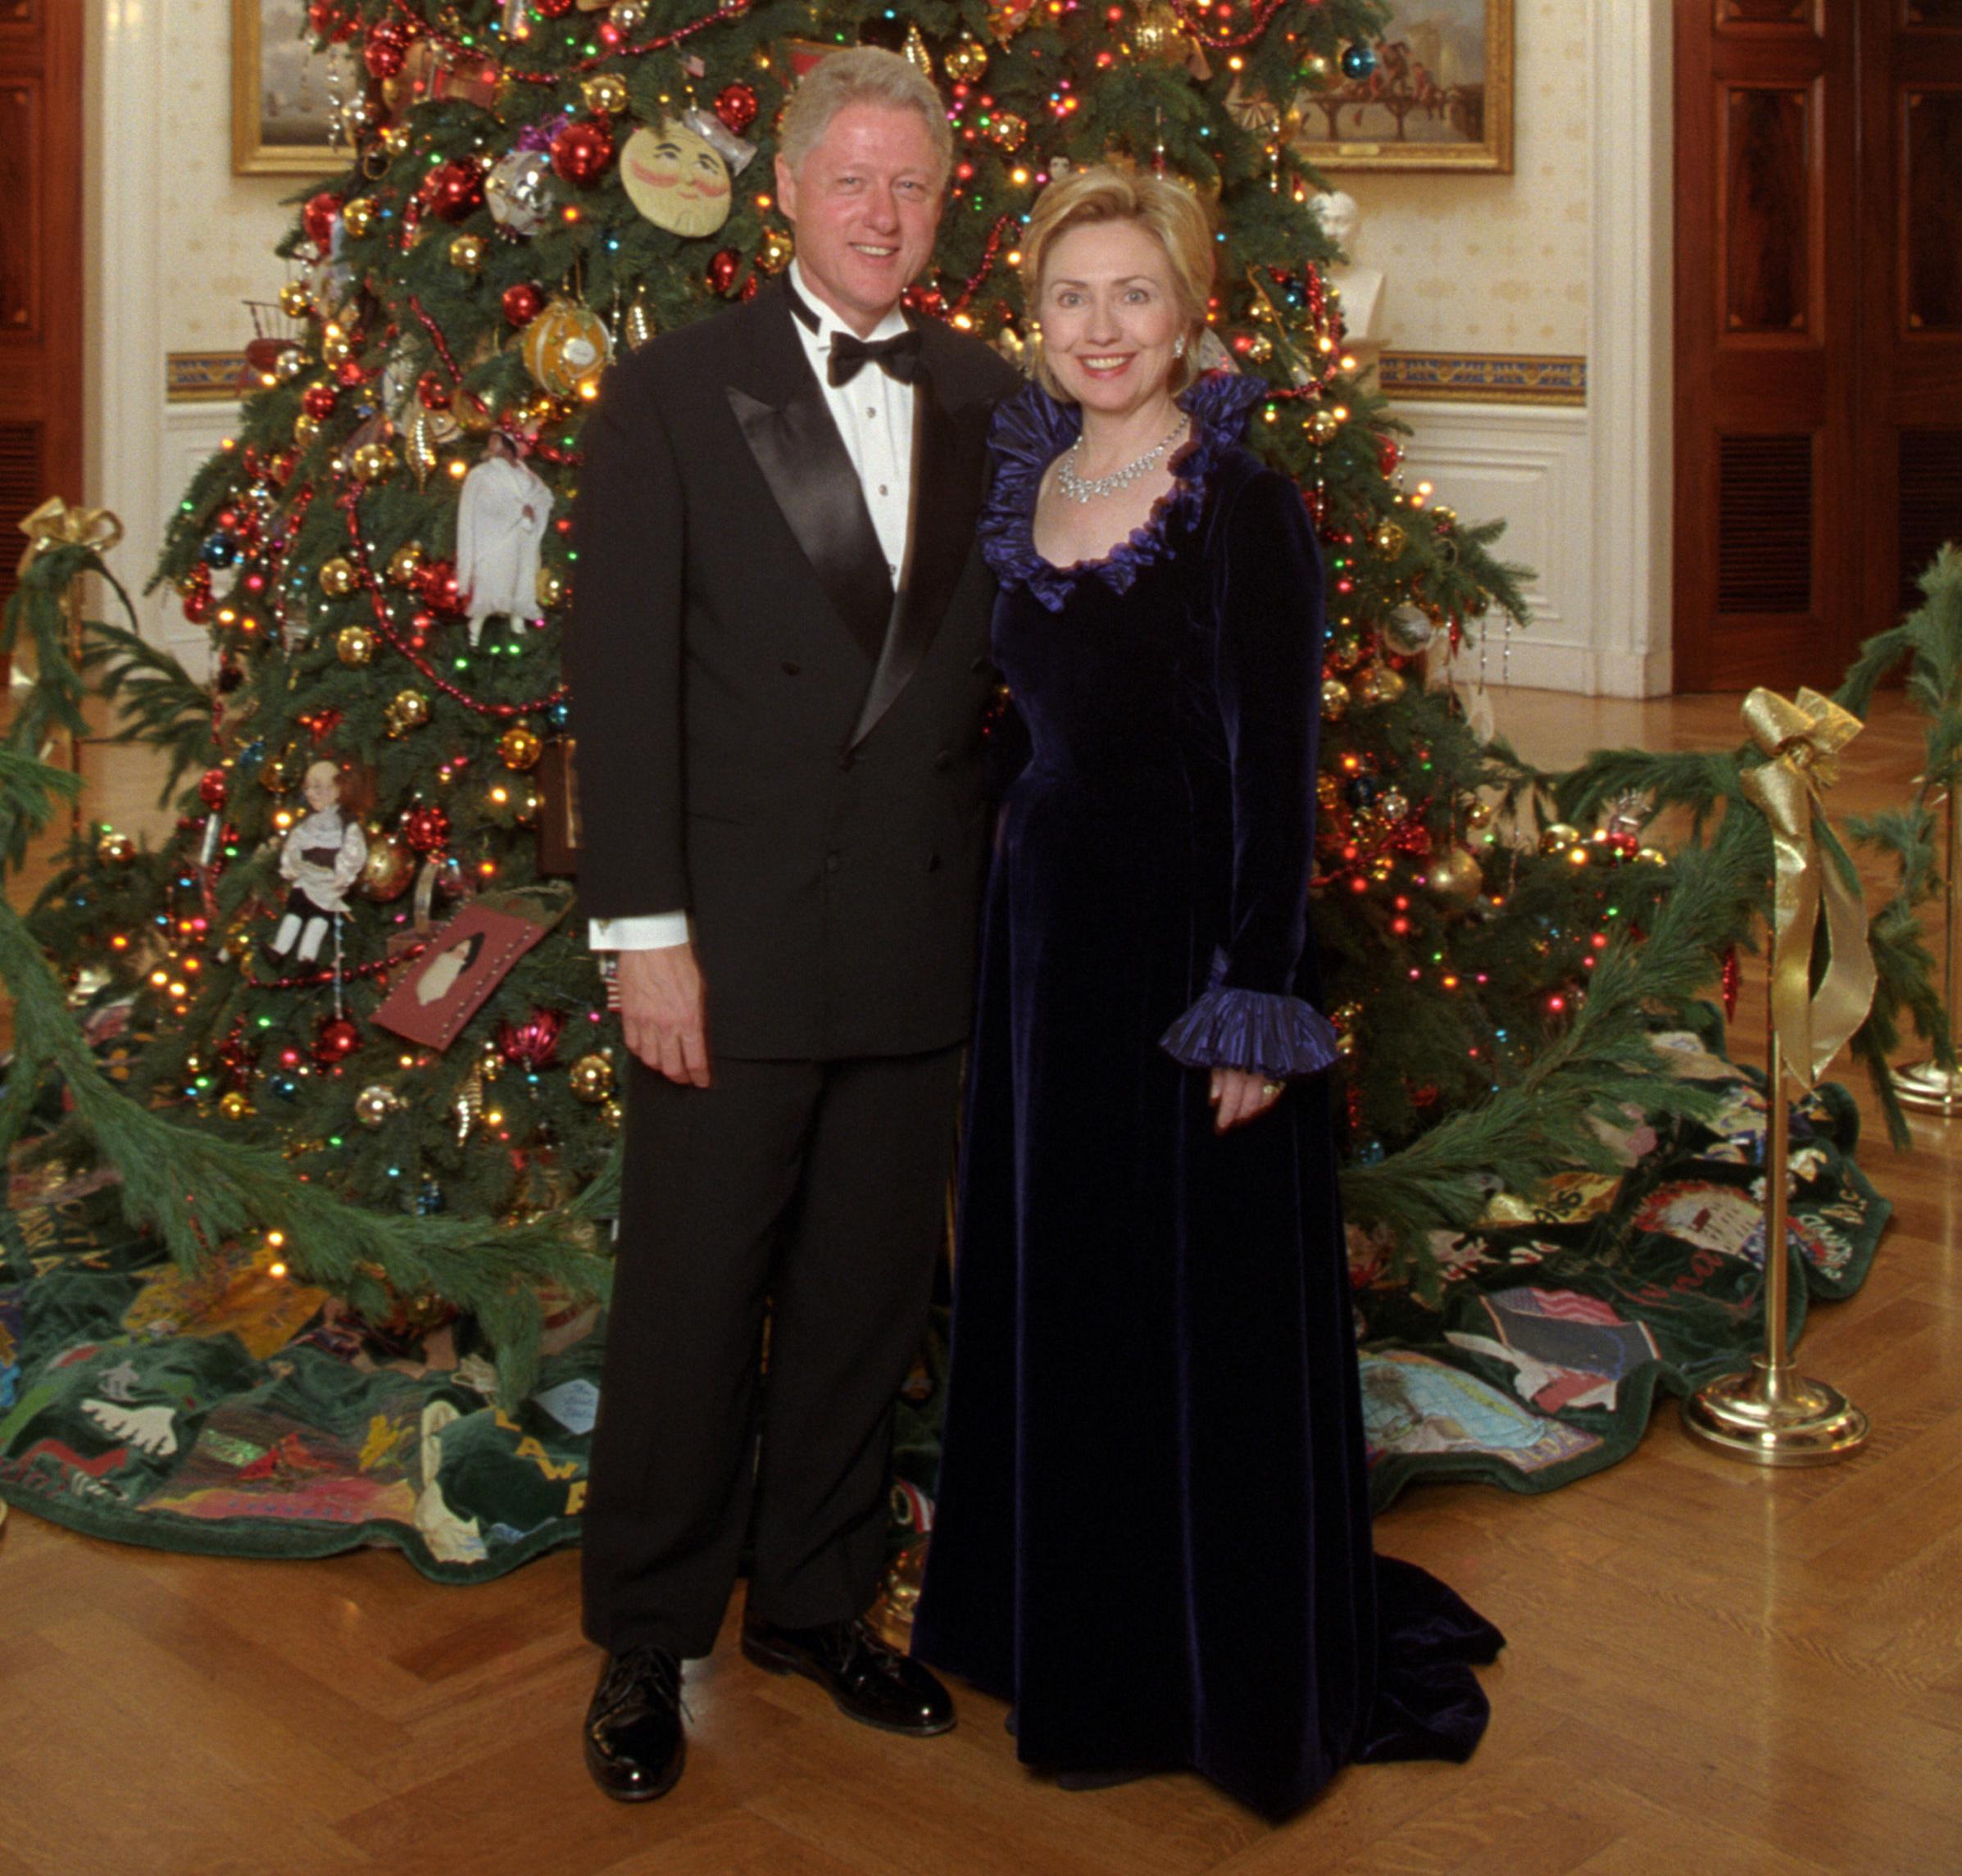 Hillary Clinton Christmas.File Bill And Hillary Clinton Christmas Portrait 1999 Cropped1 Jpg